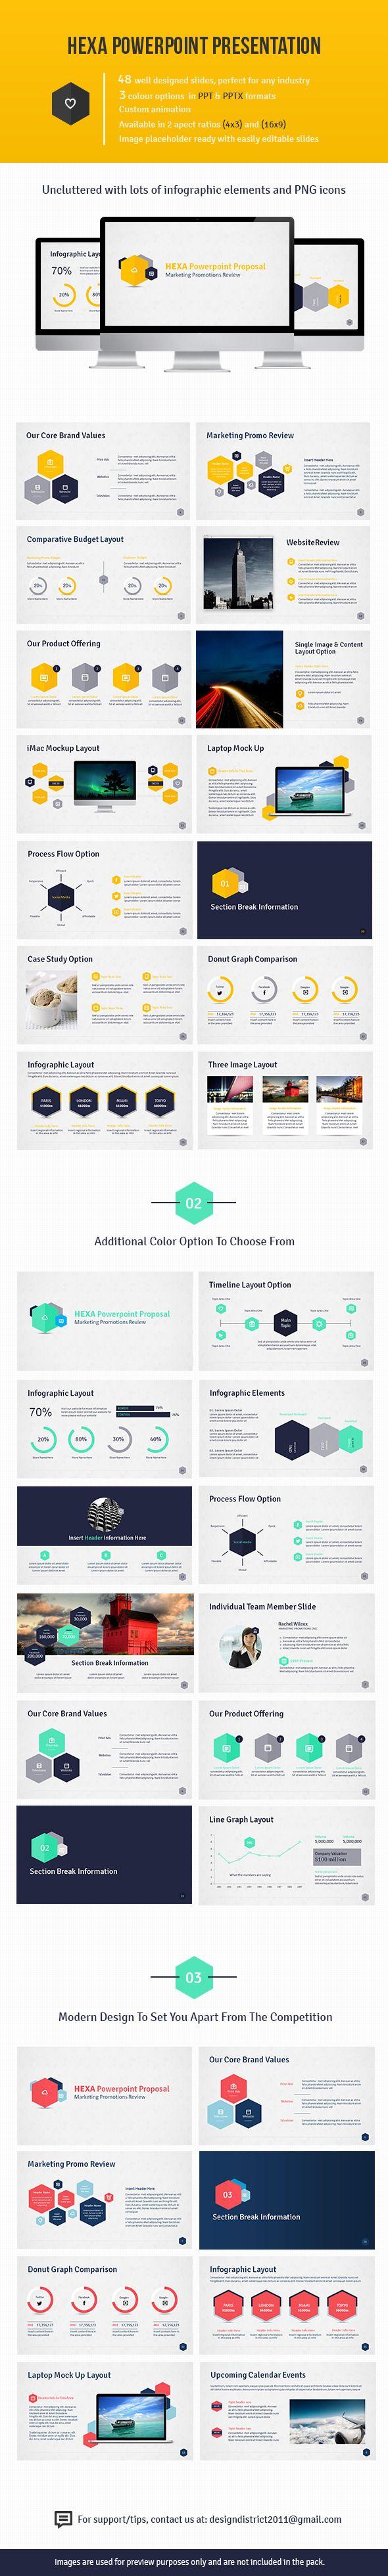 Hexa Powerpoint Presentation - Business PowerPoint Templates